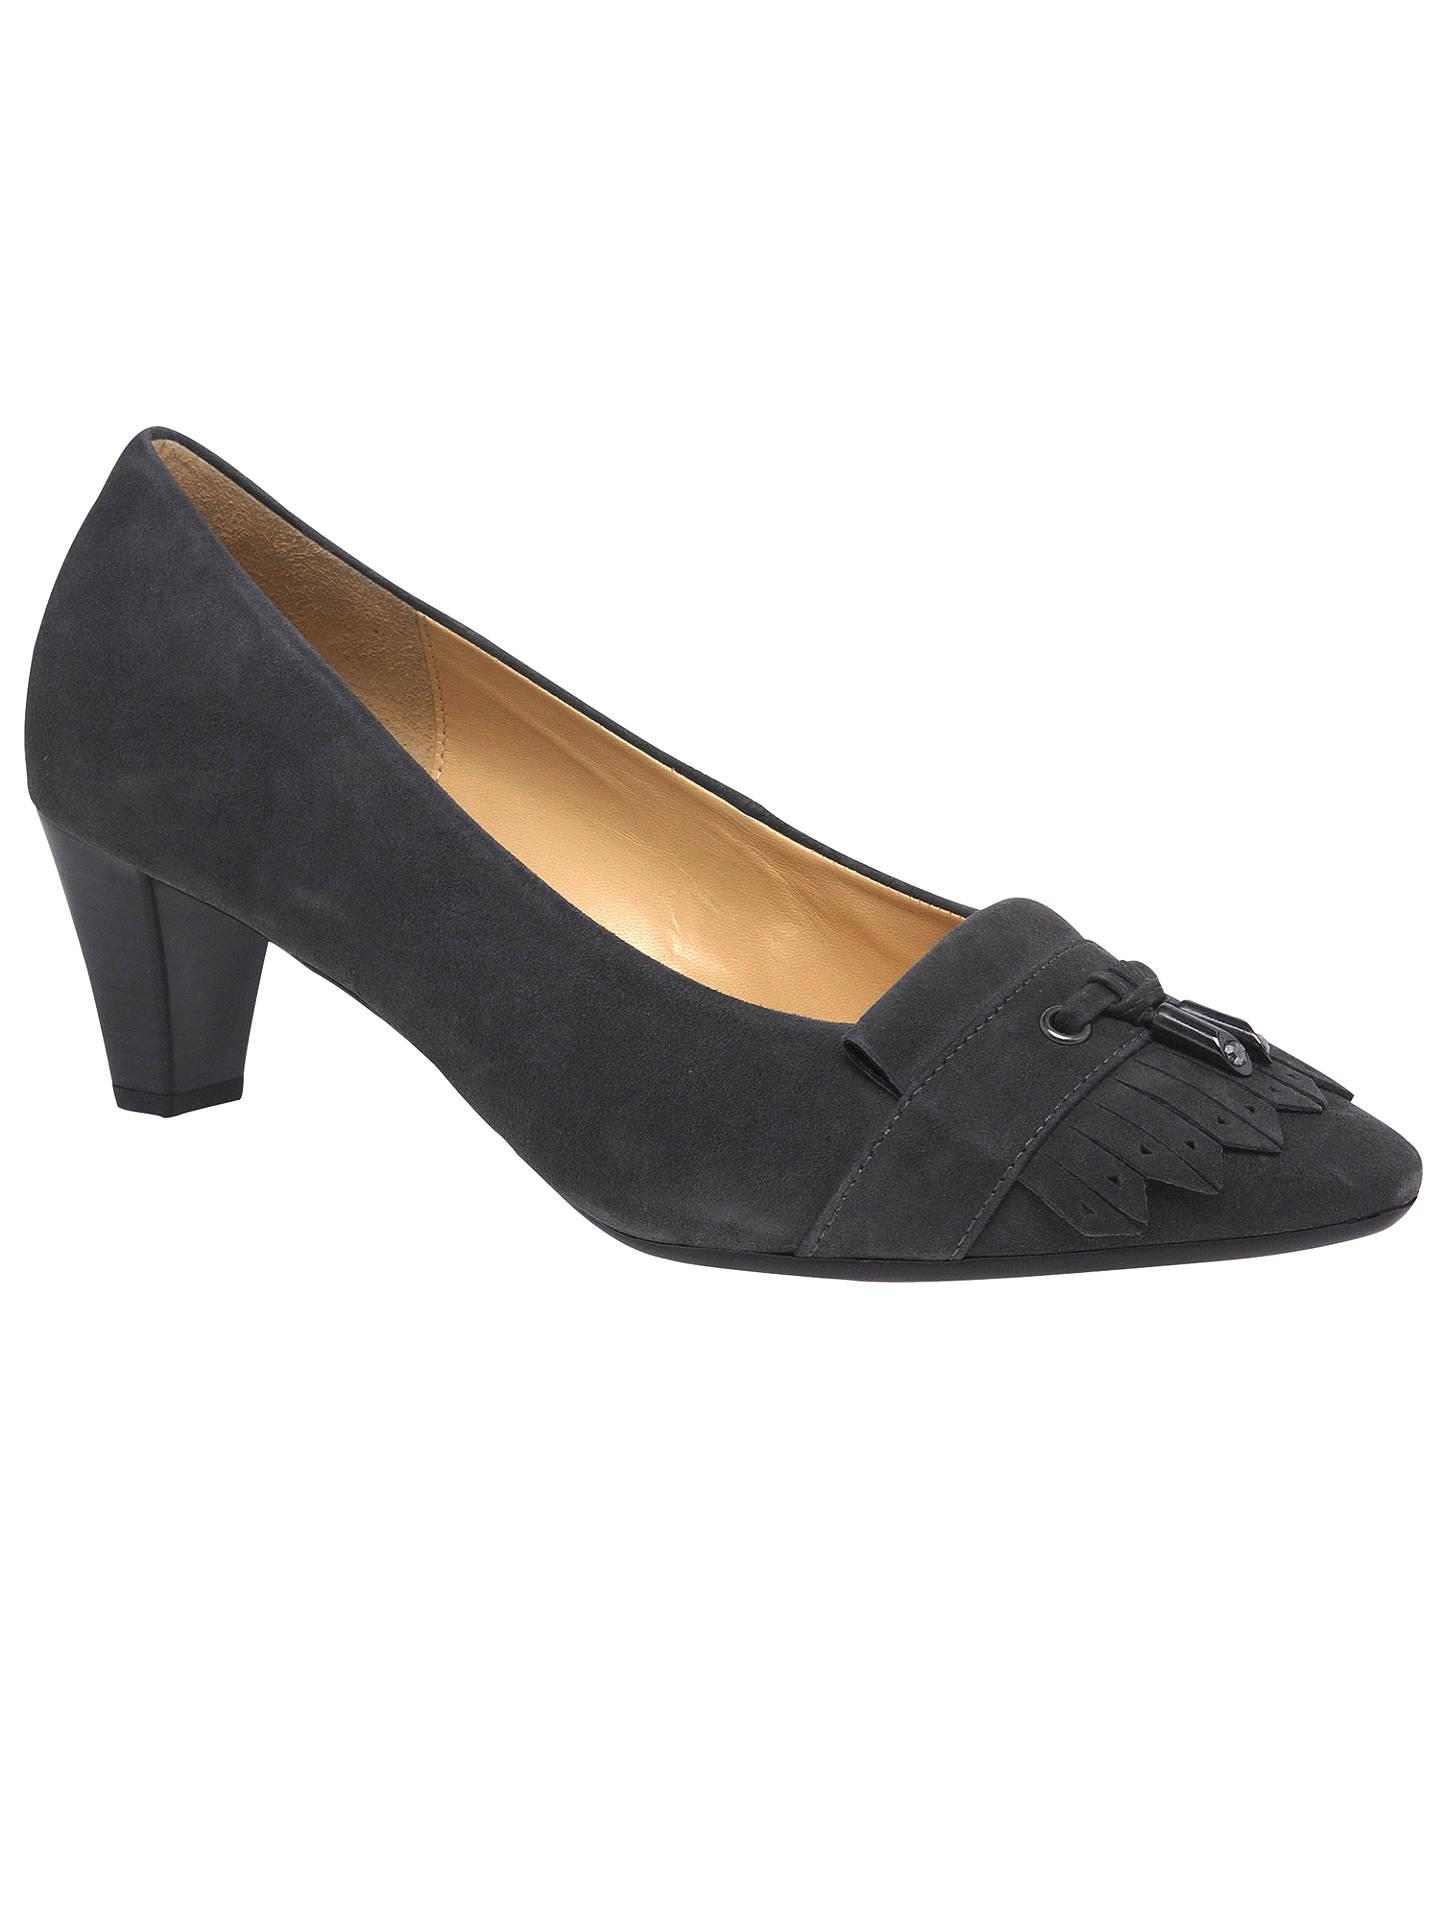 c285c1aef1 BuyGabor Brindon Fringed Court Shoes, Grey, 3 Online at johnlewis.com ...